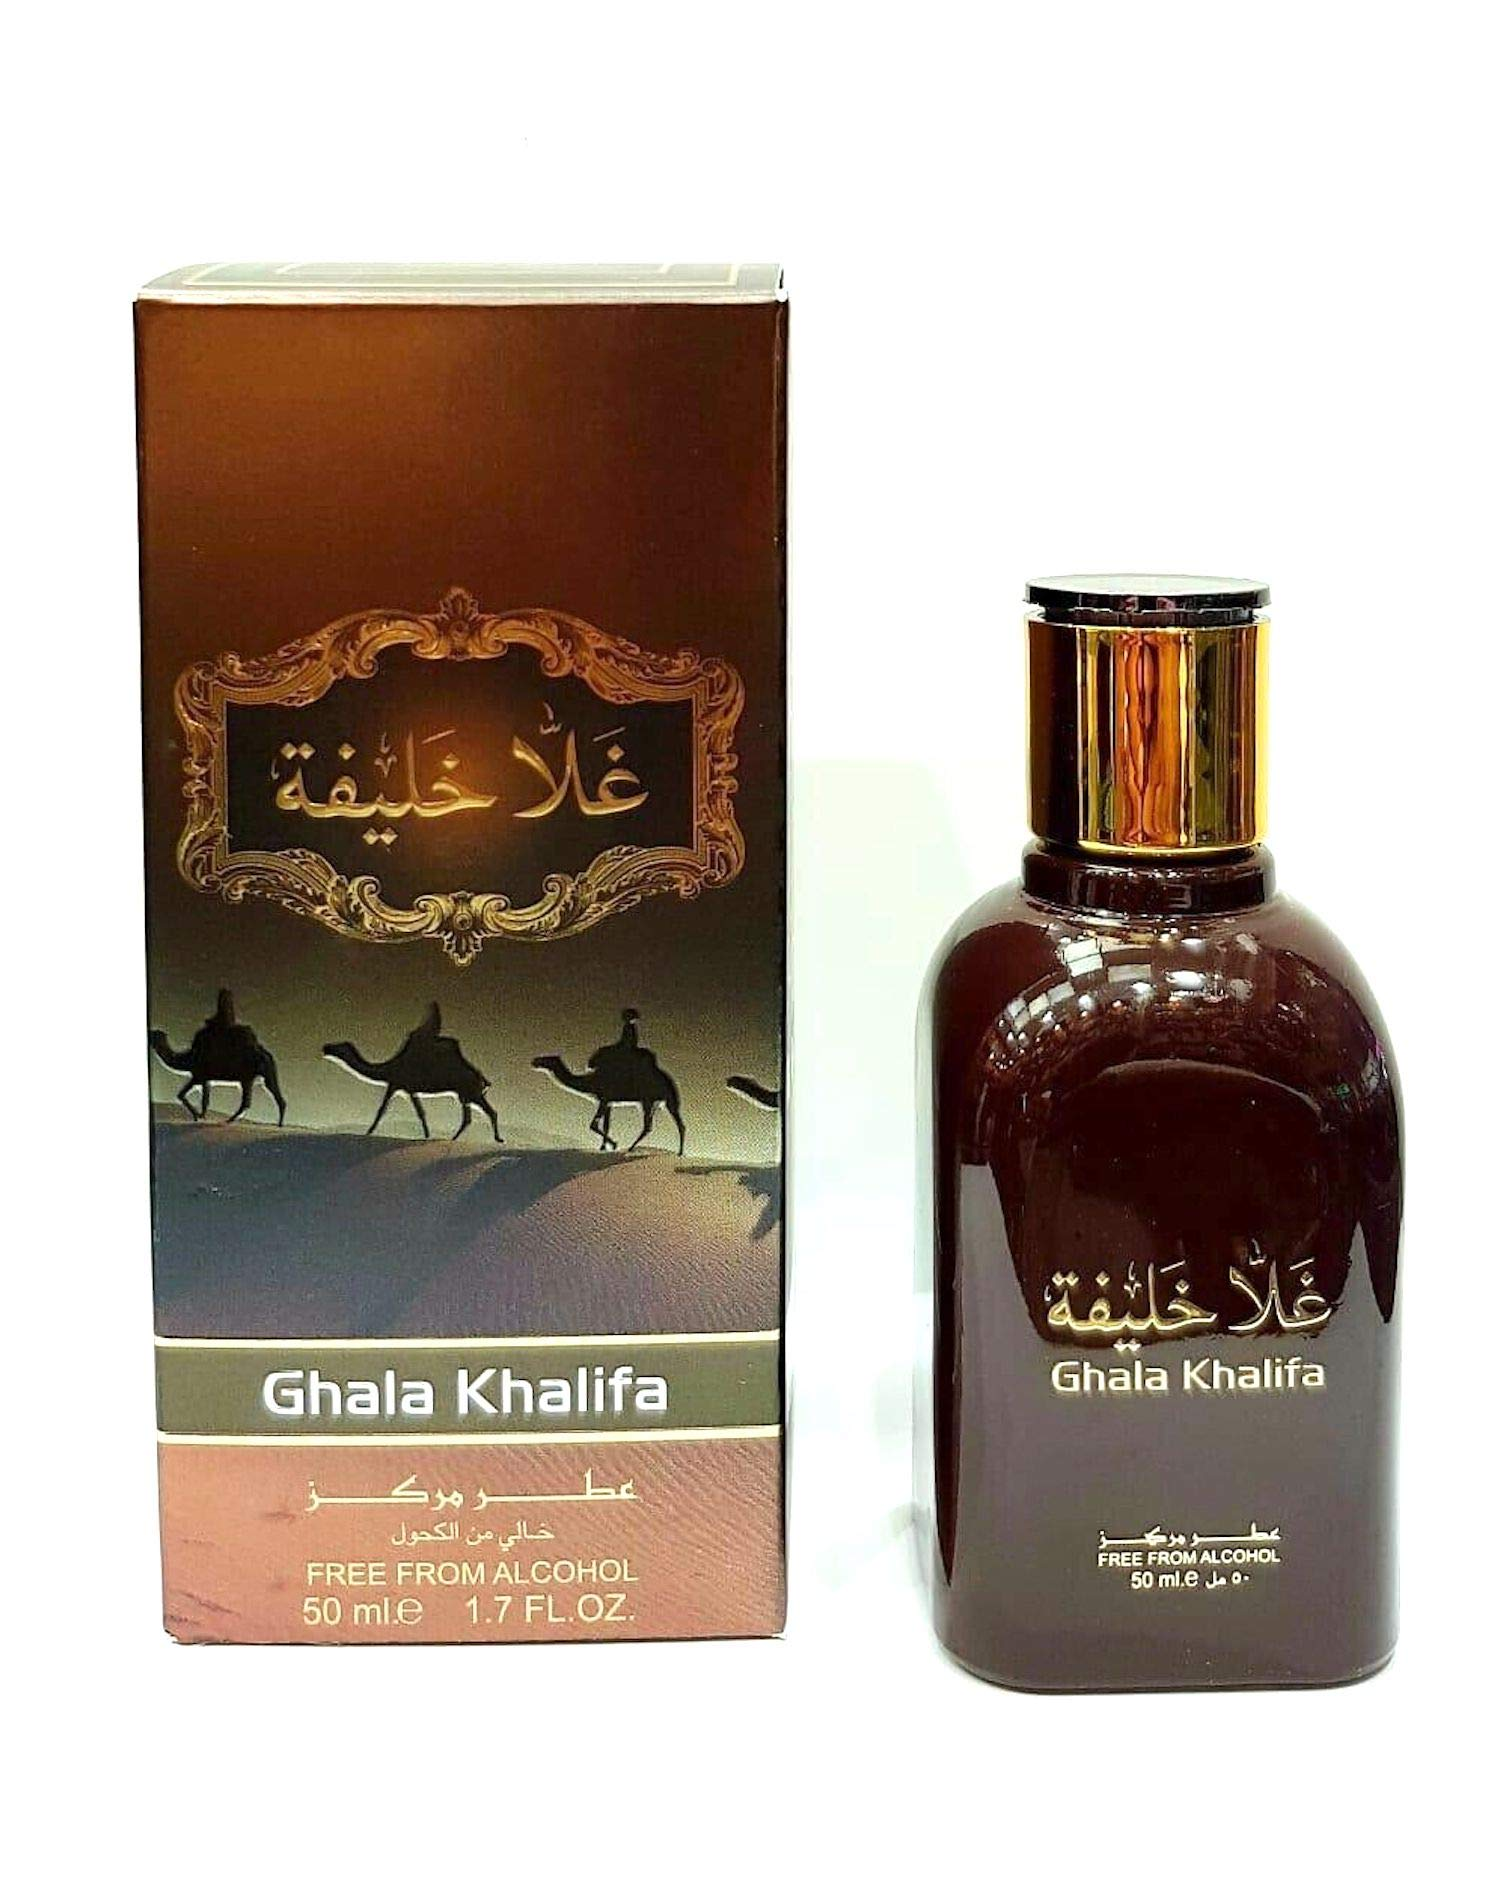 Ghala Khalifa Tobacco Oud 50 ML Attar Oil Concentrated Perfume